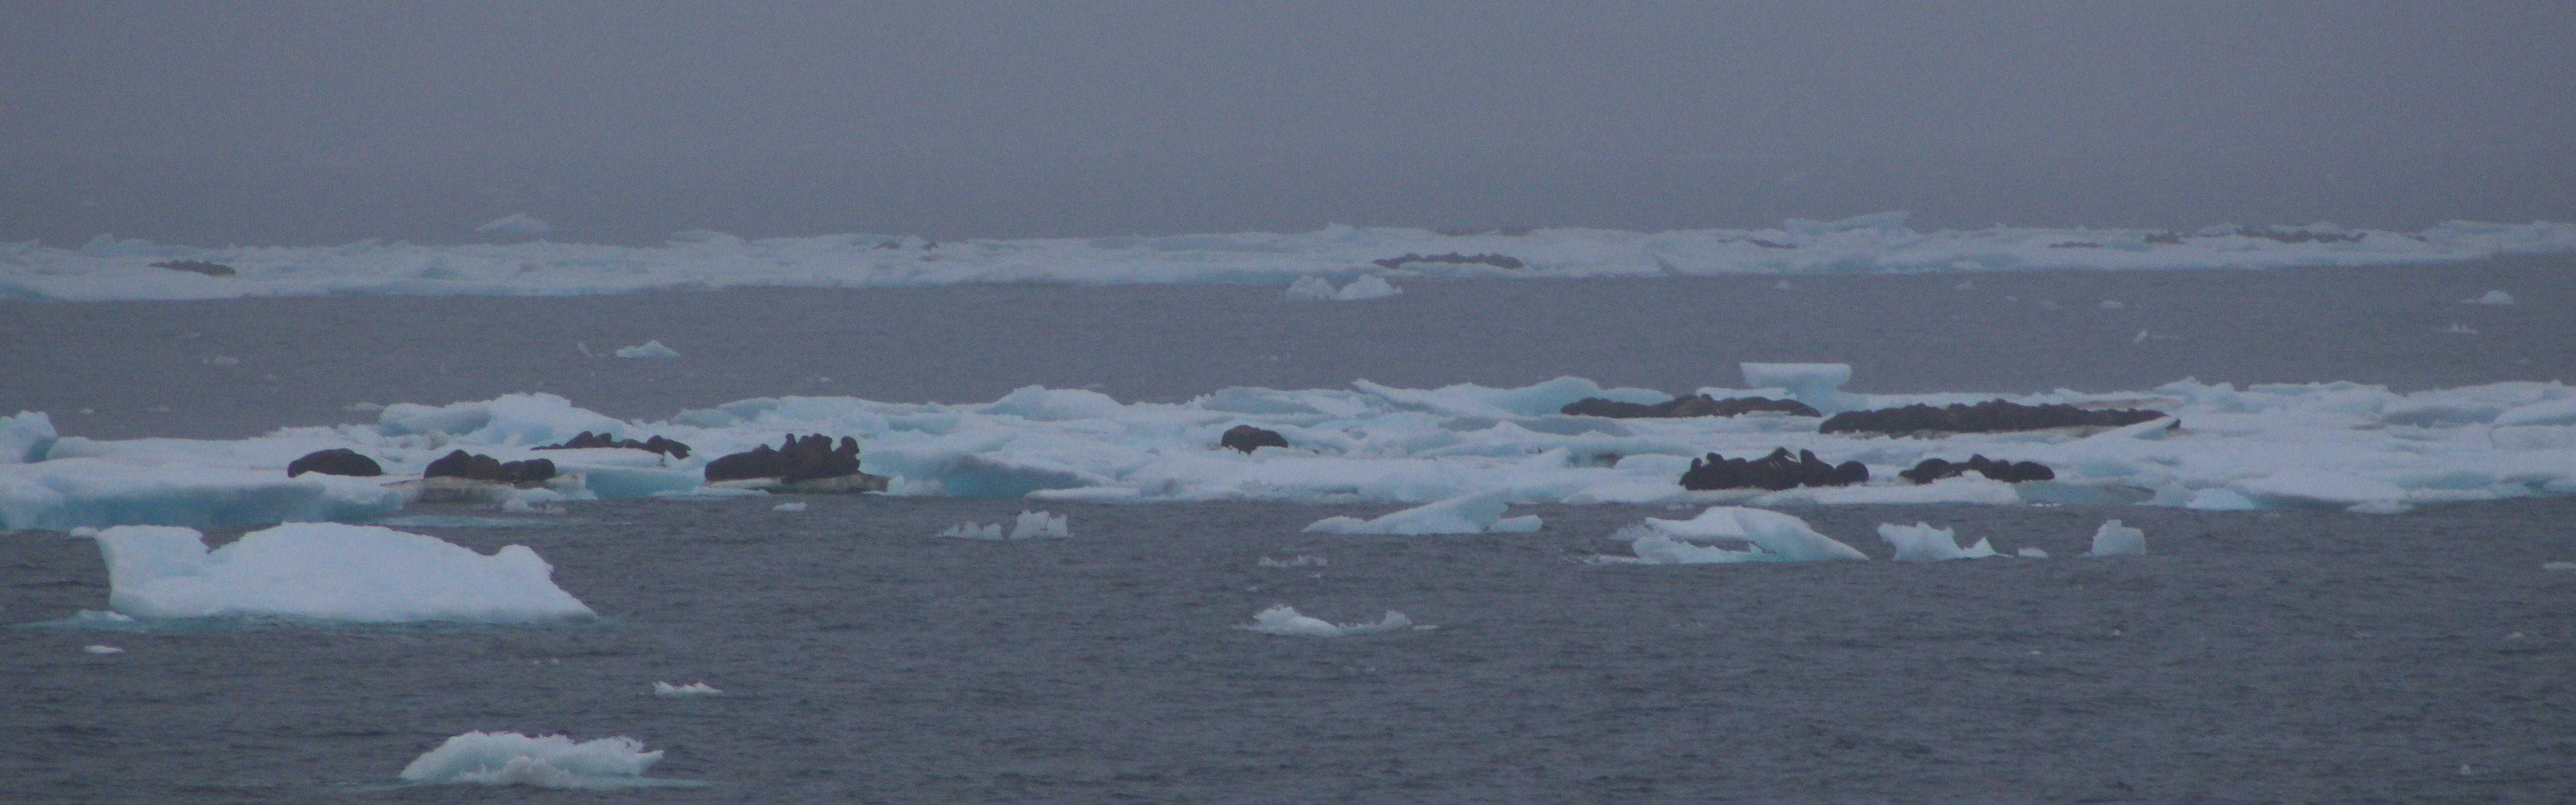 Walrus dot the seascape